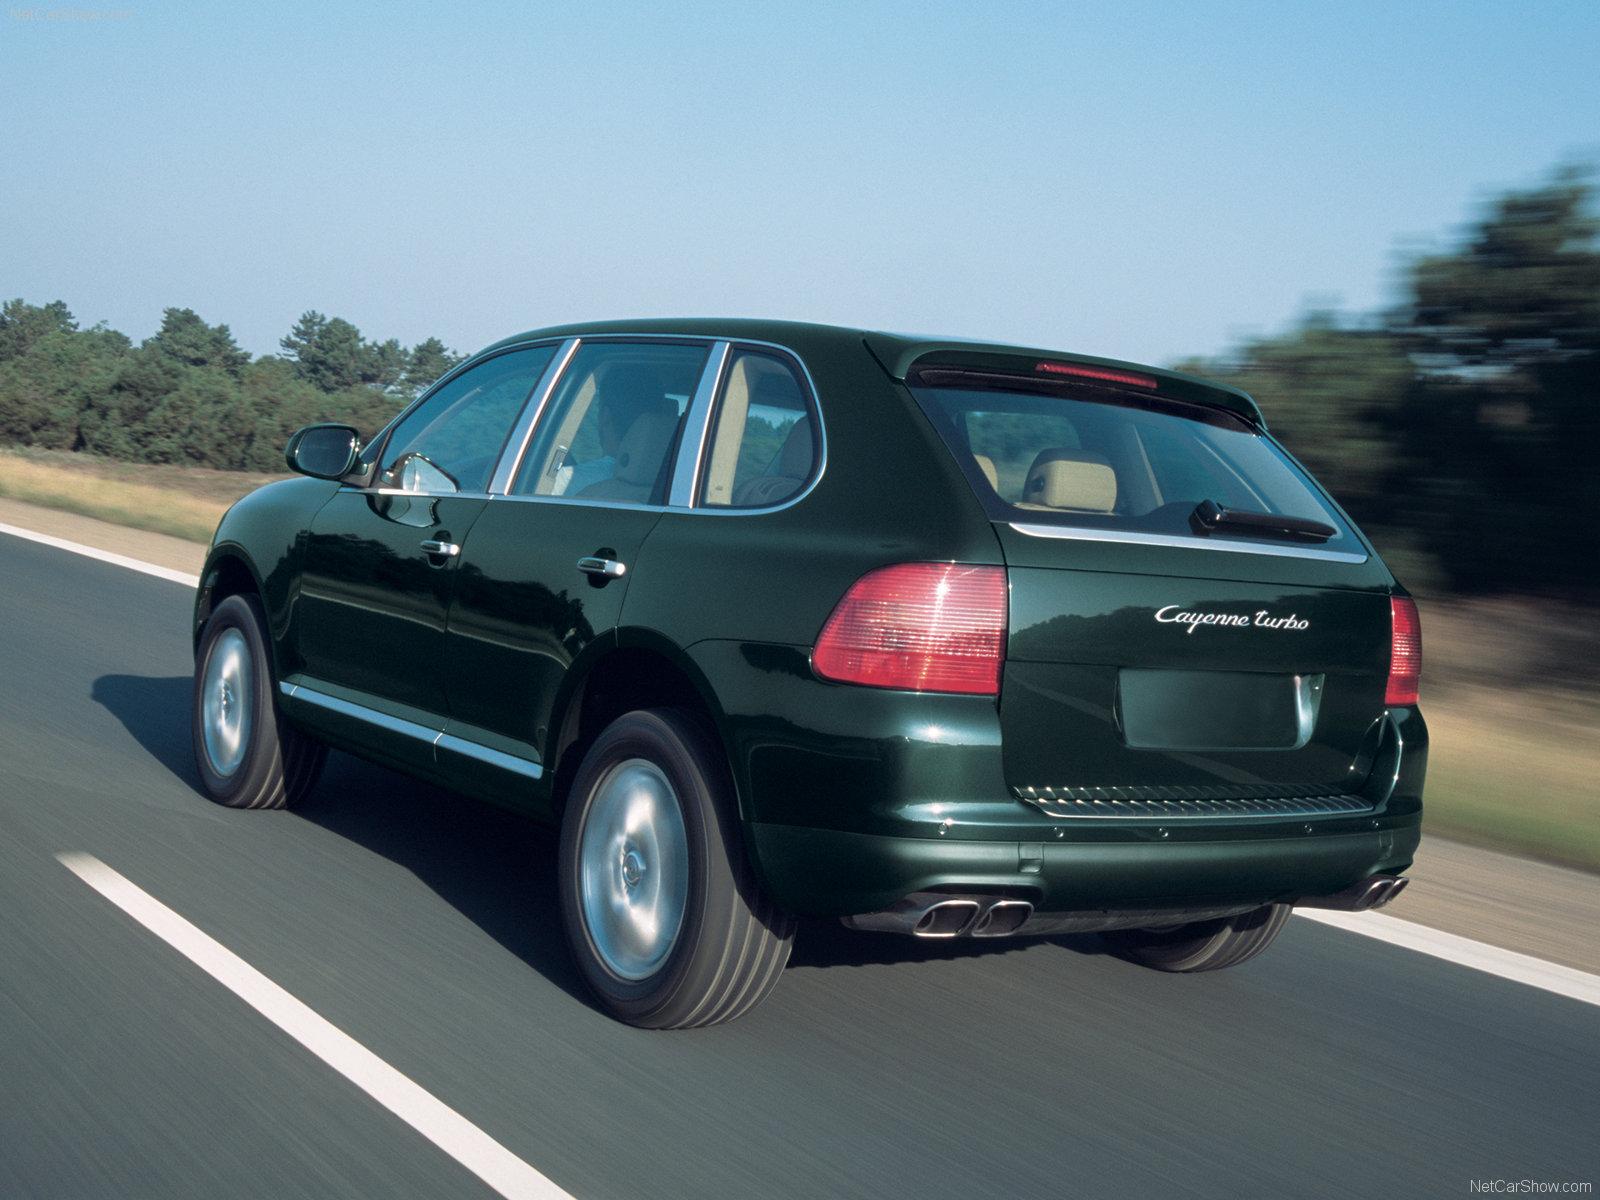 2003 Cayenne Turbo